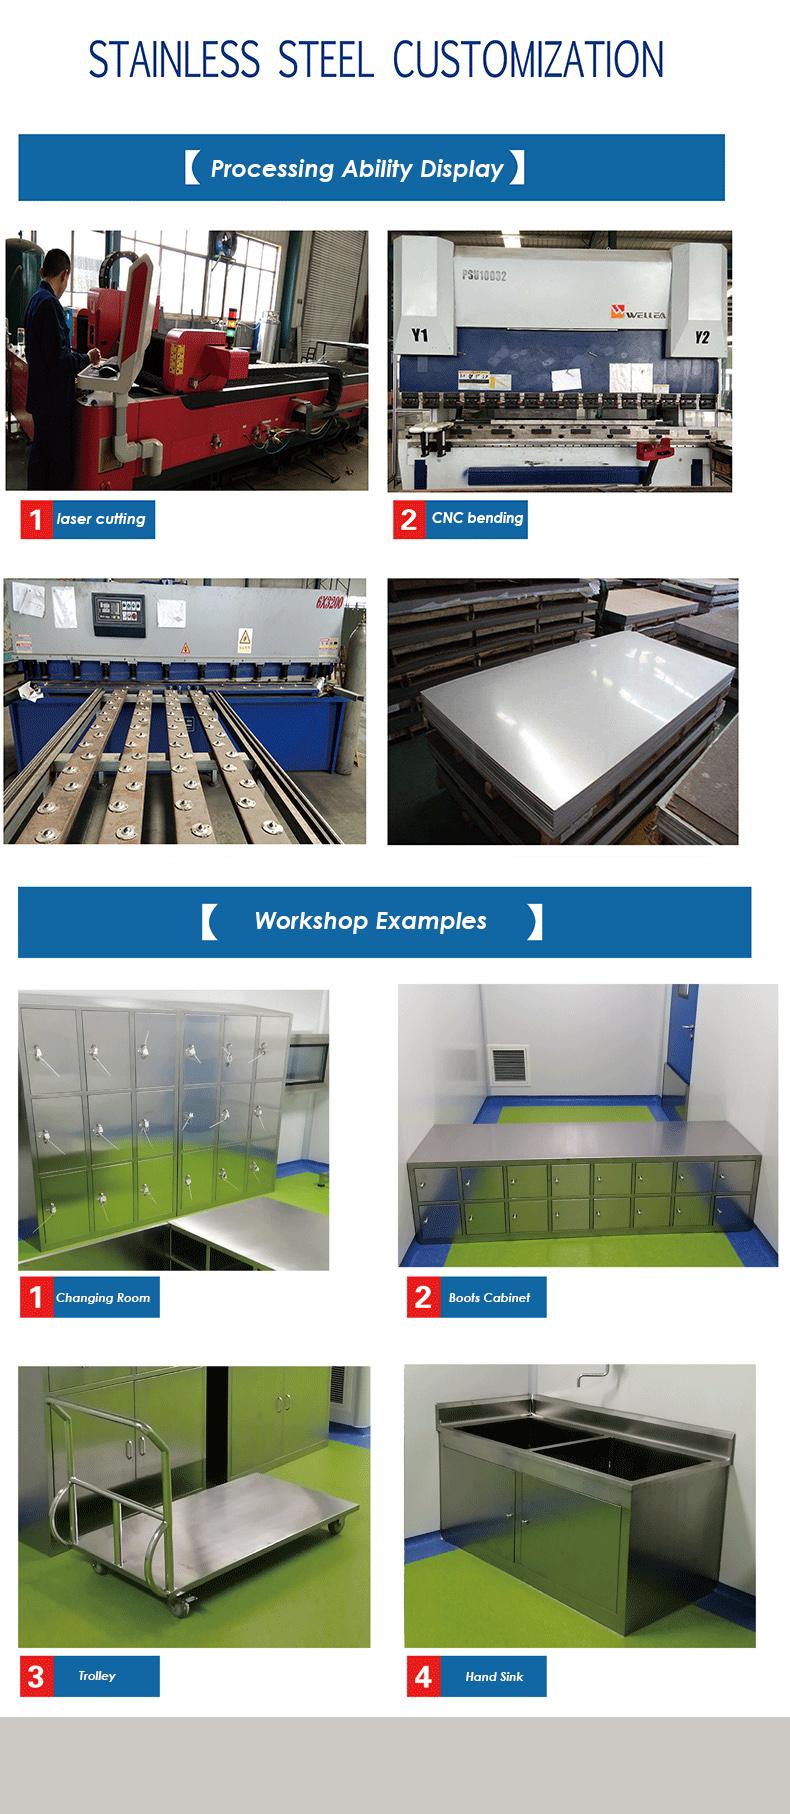 Workshop Examples